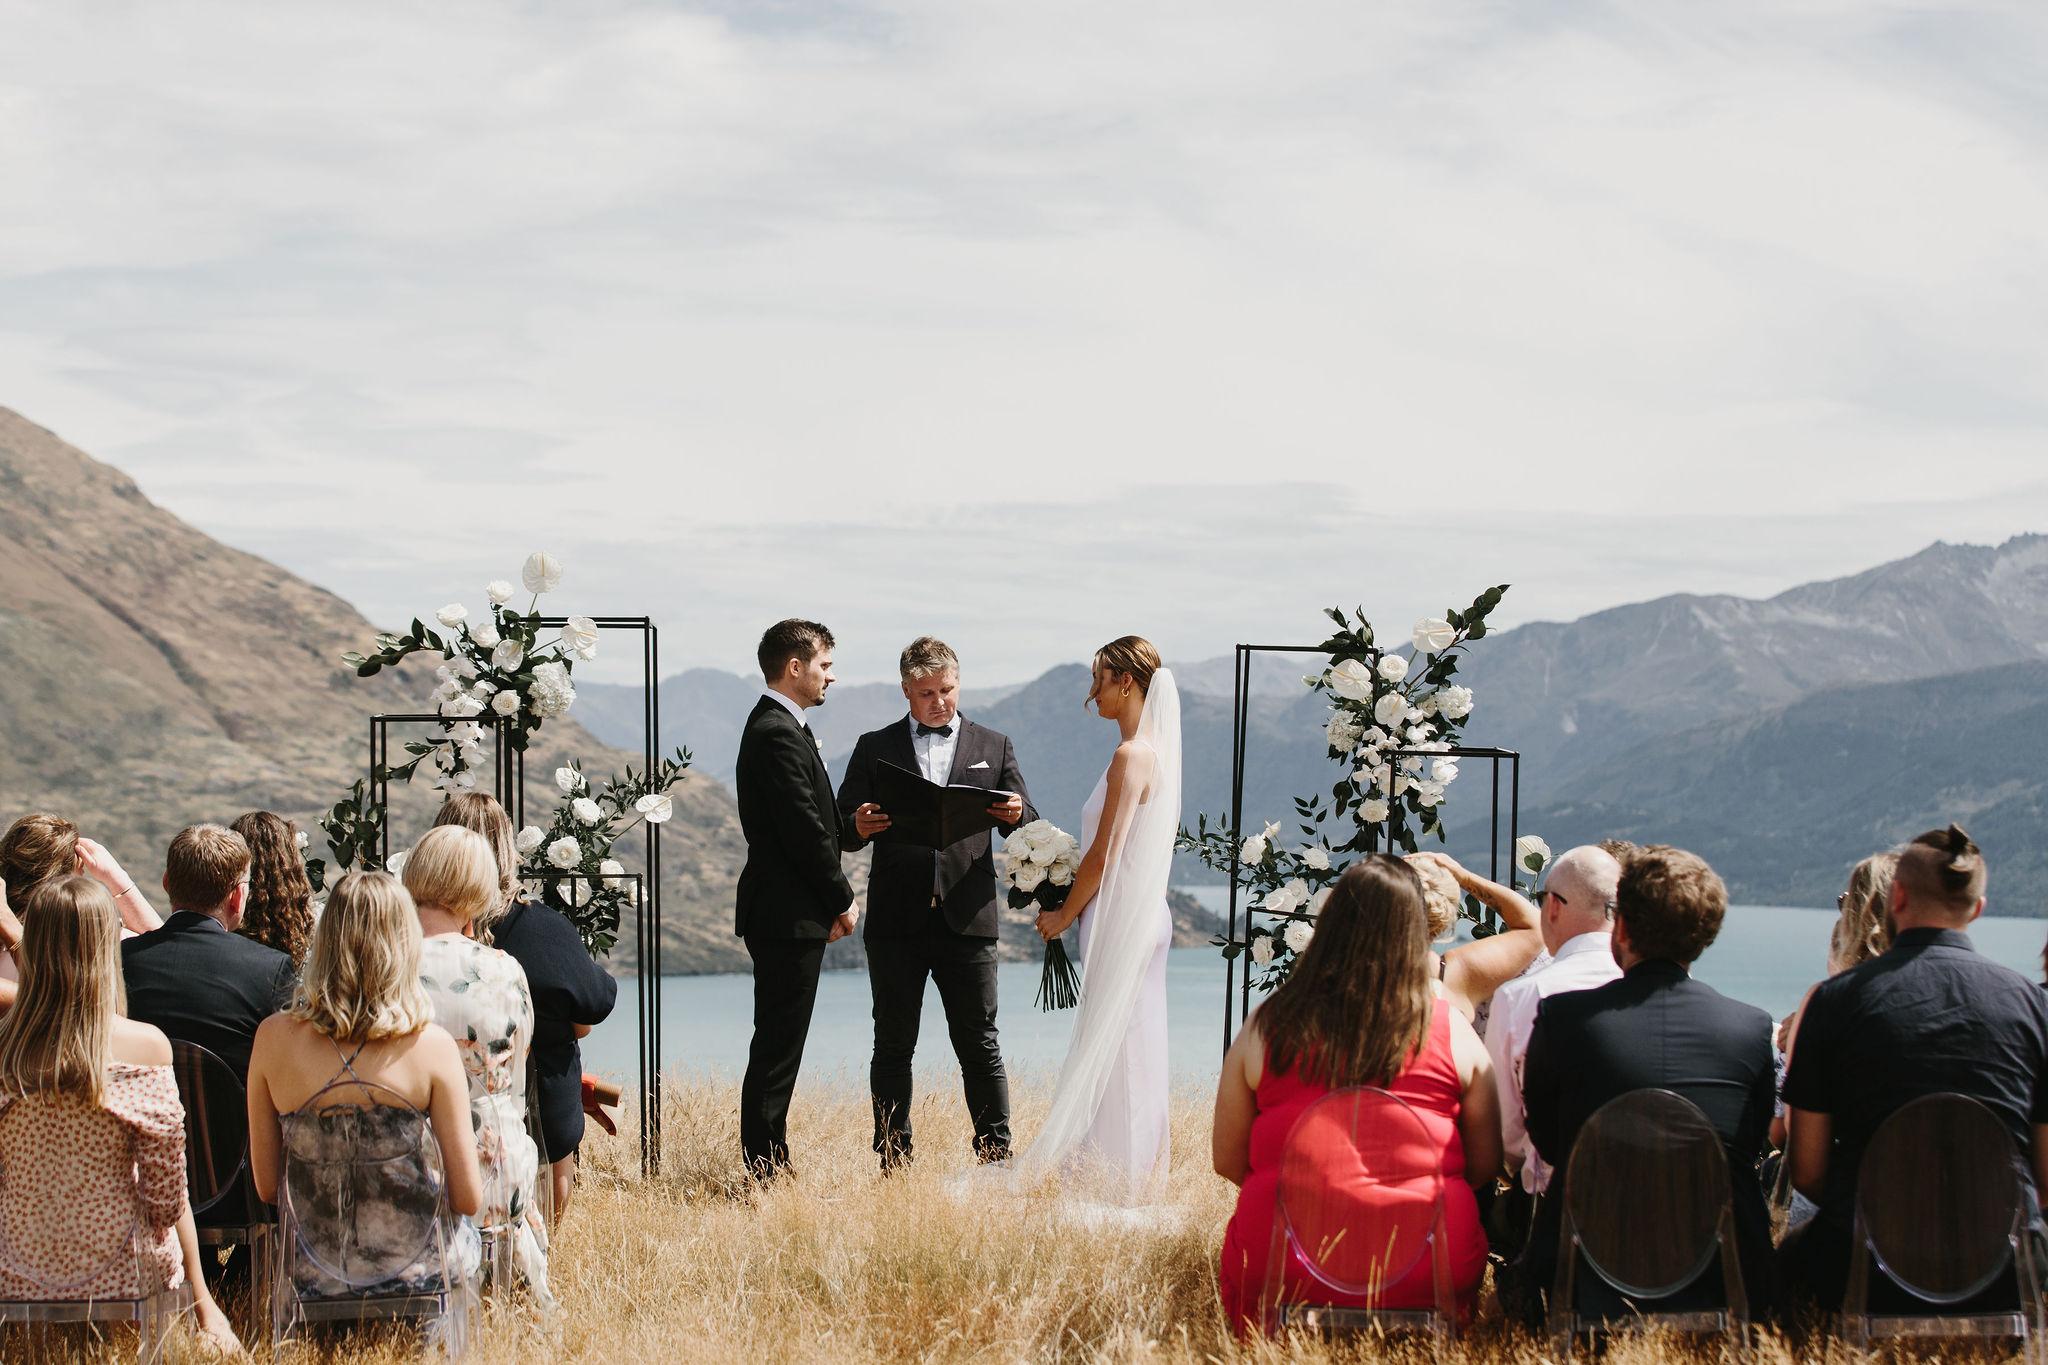 queenstown-wedding-celebrant-jacks-point-lovers-elopement-cohollyjoshwedding-70